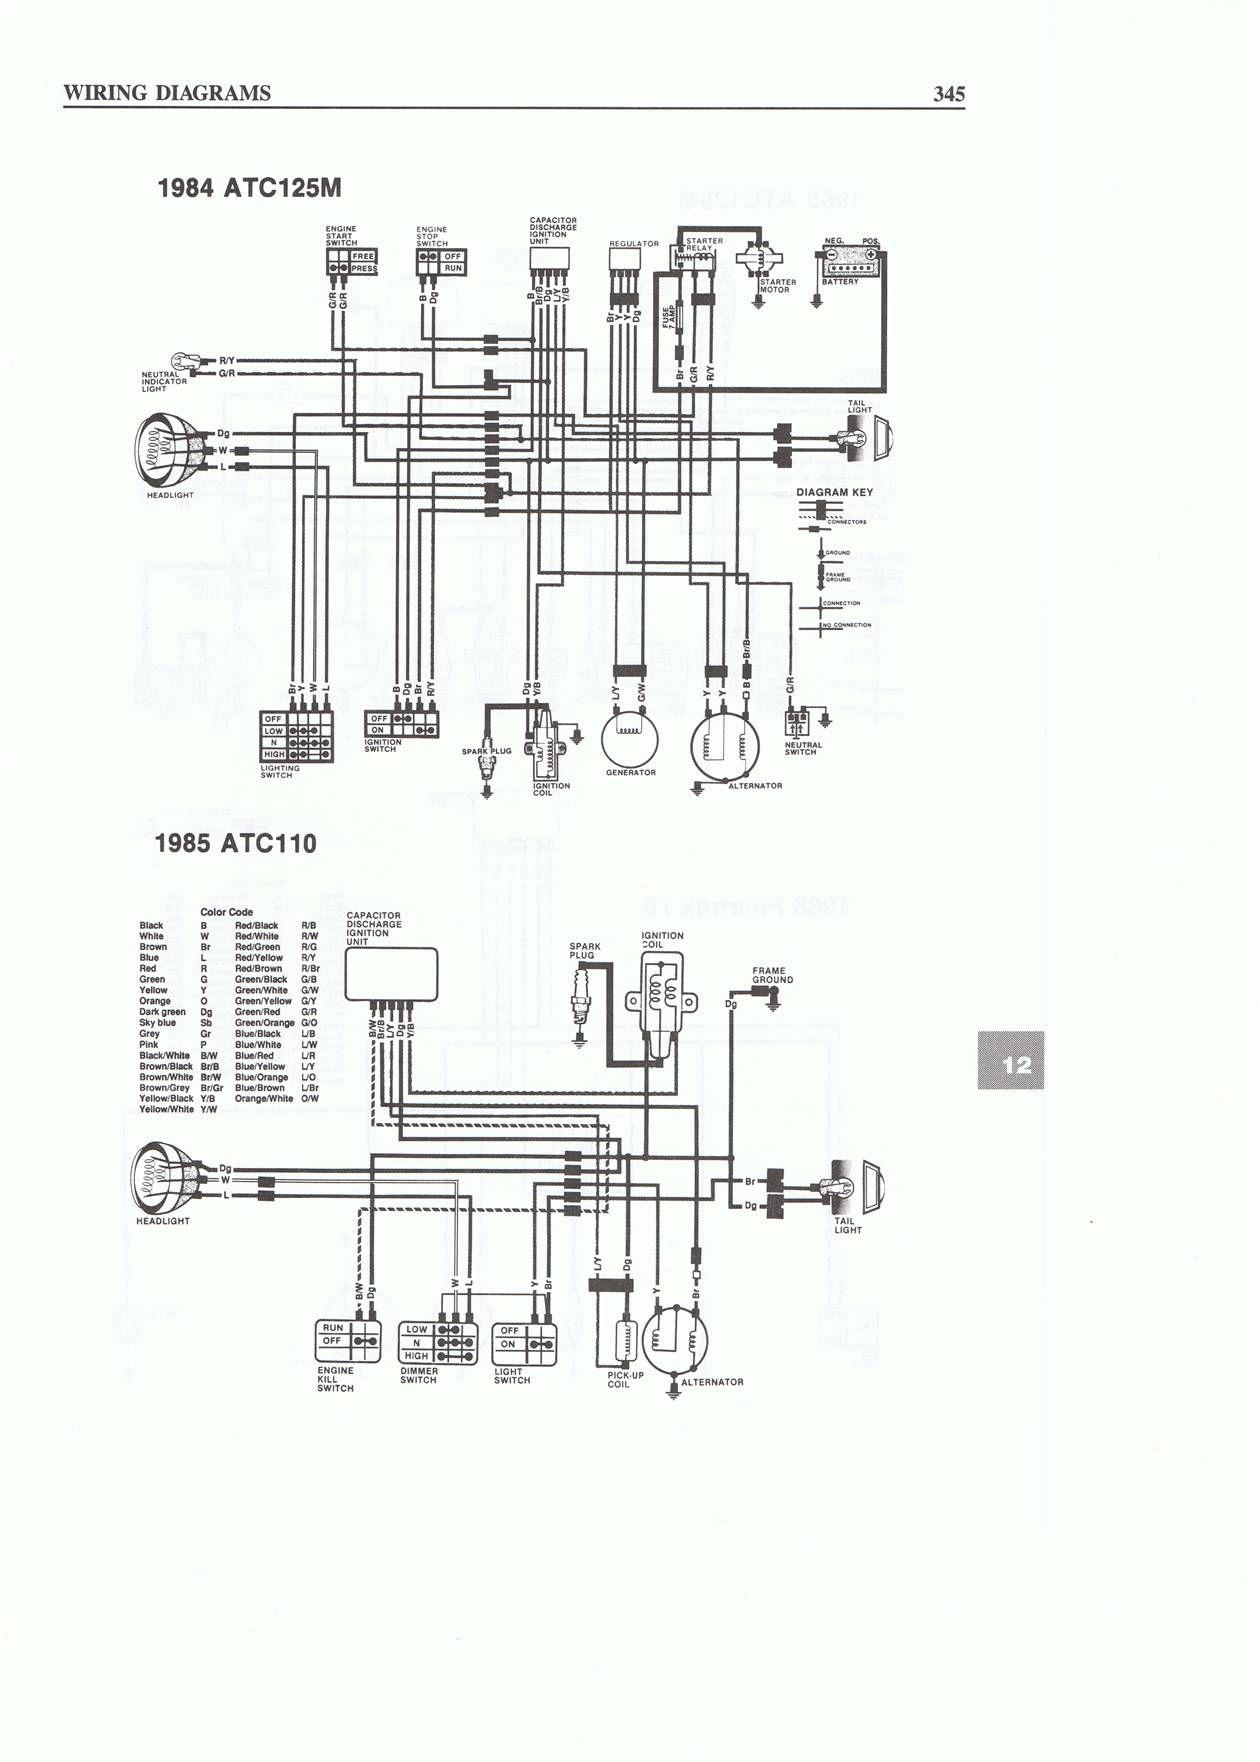 [WLLP_2054]   Sunl 250 Scooter Wiring Diagram - Iphone 4 Diagram Logic Board for Wiring  Diagram Schematics | Scooter Stator Wiring Diagram |  | Wiring Diagram Schematics